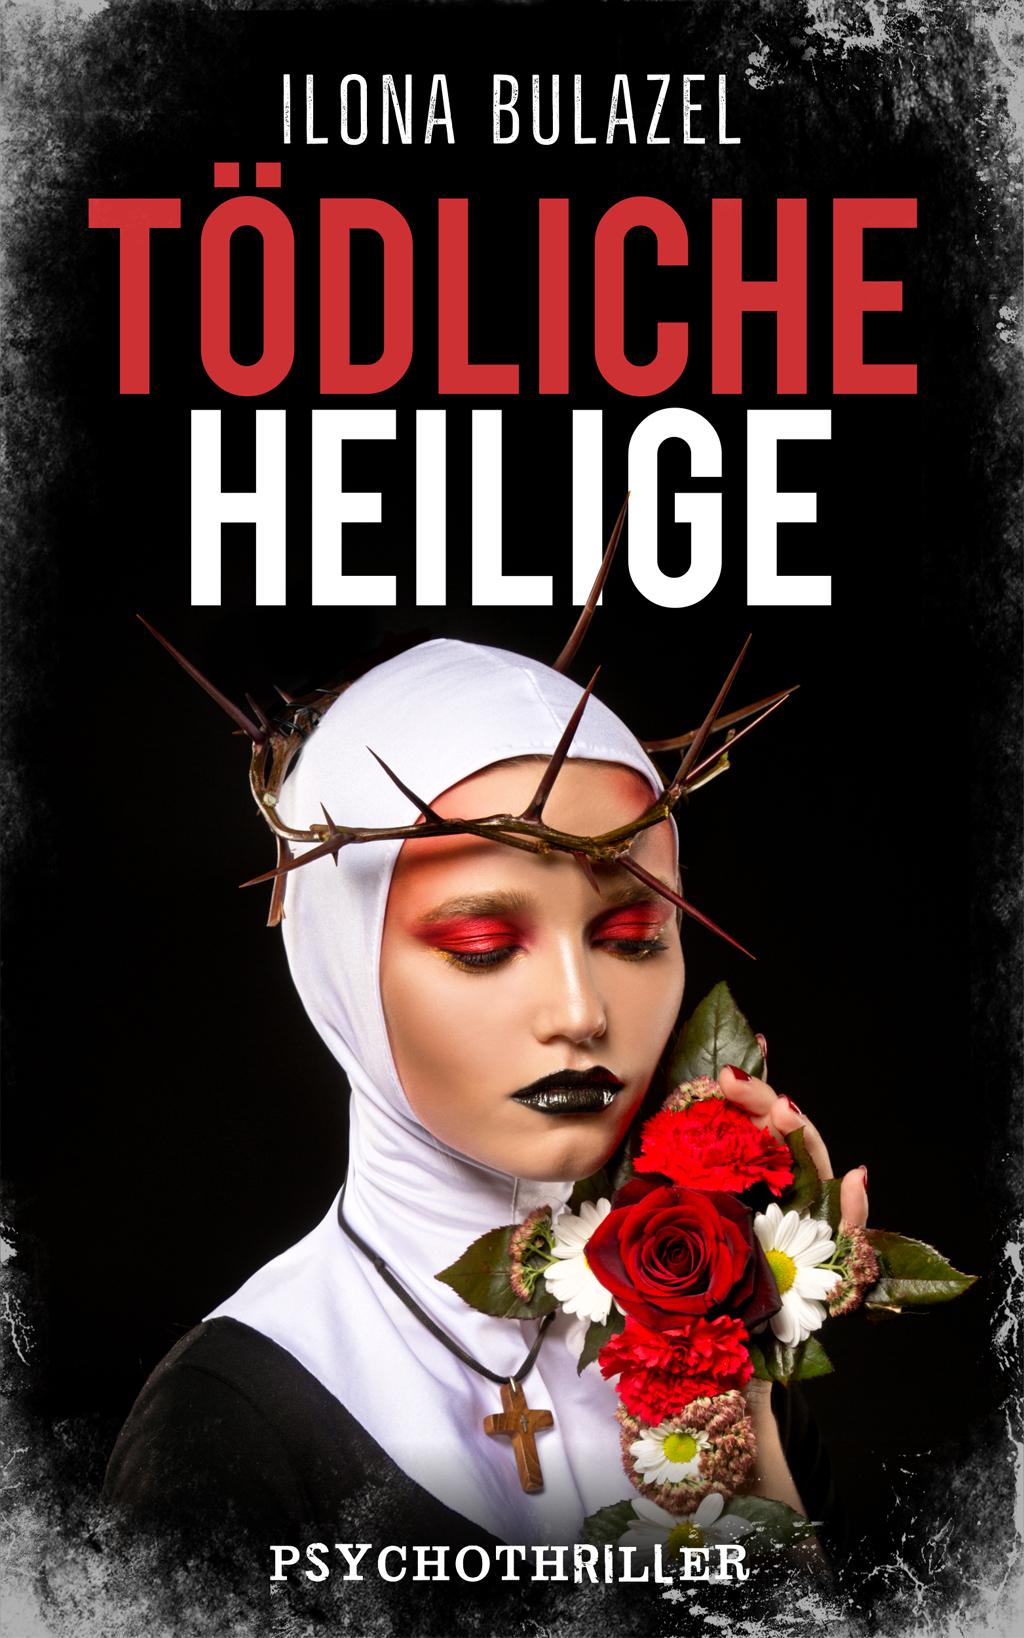 Ilona Bulazel - Tödliche Heilige